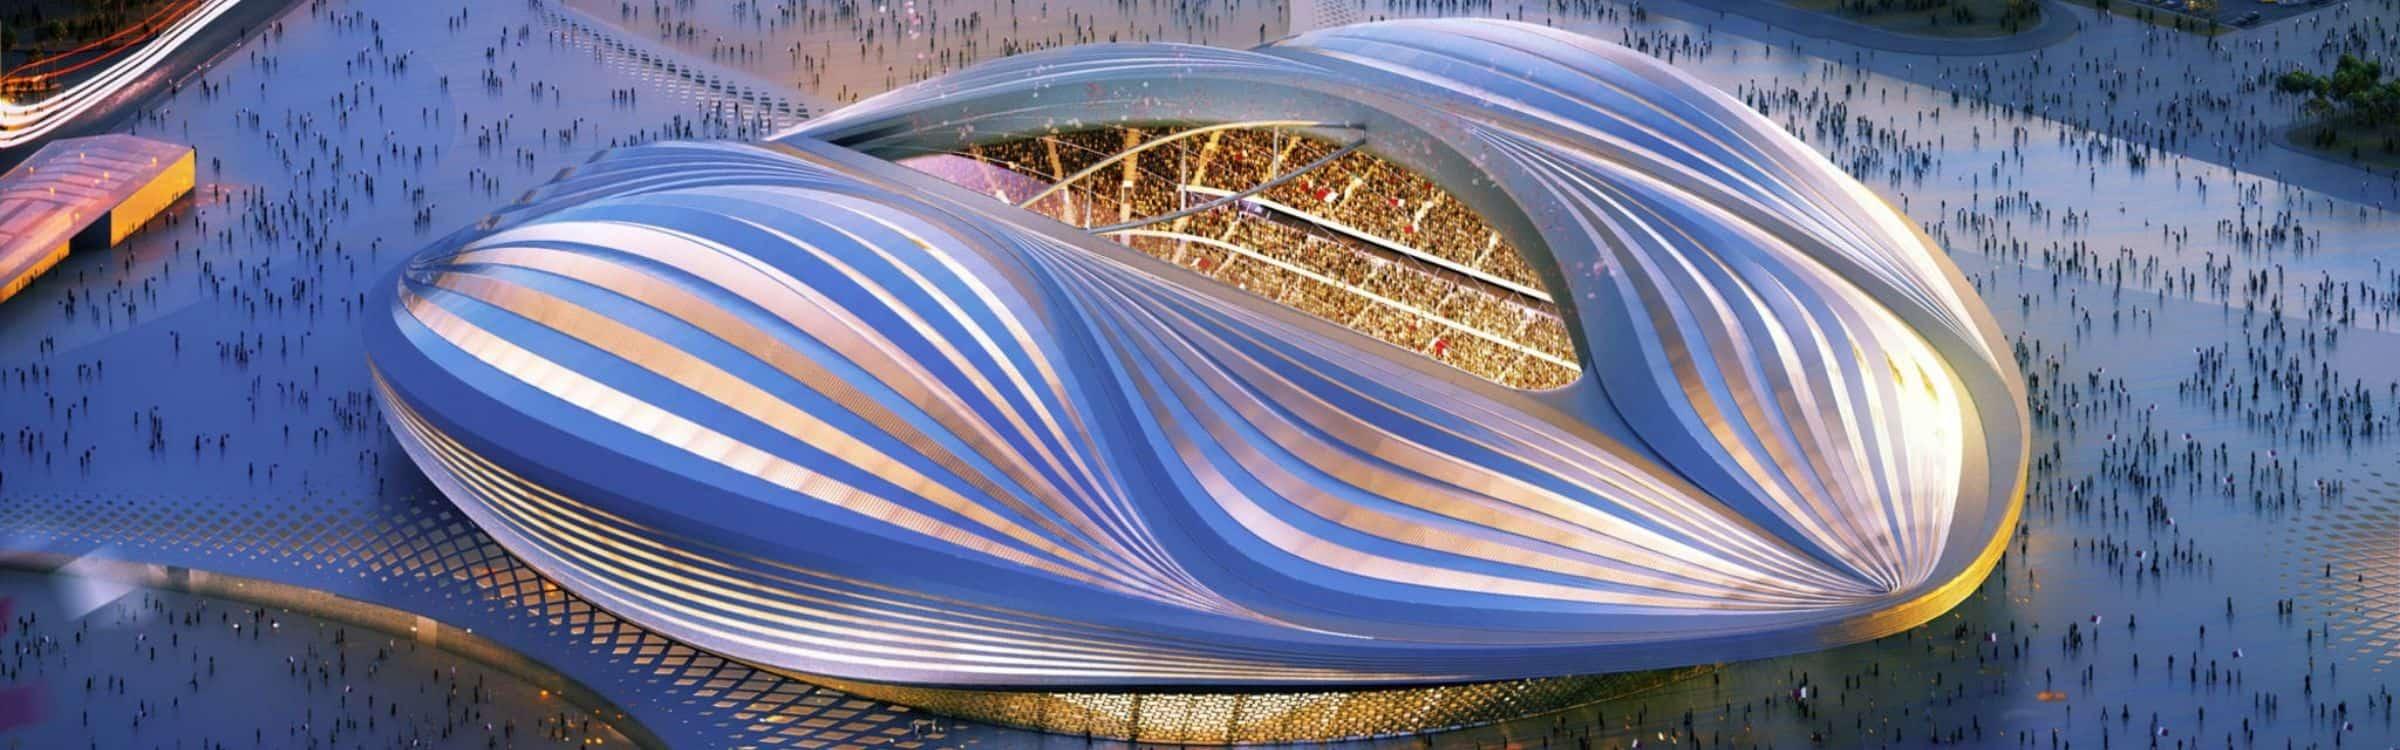 Al Janoub Stadium - Surespan Case Study